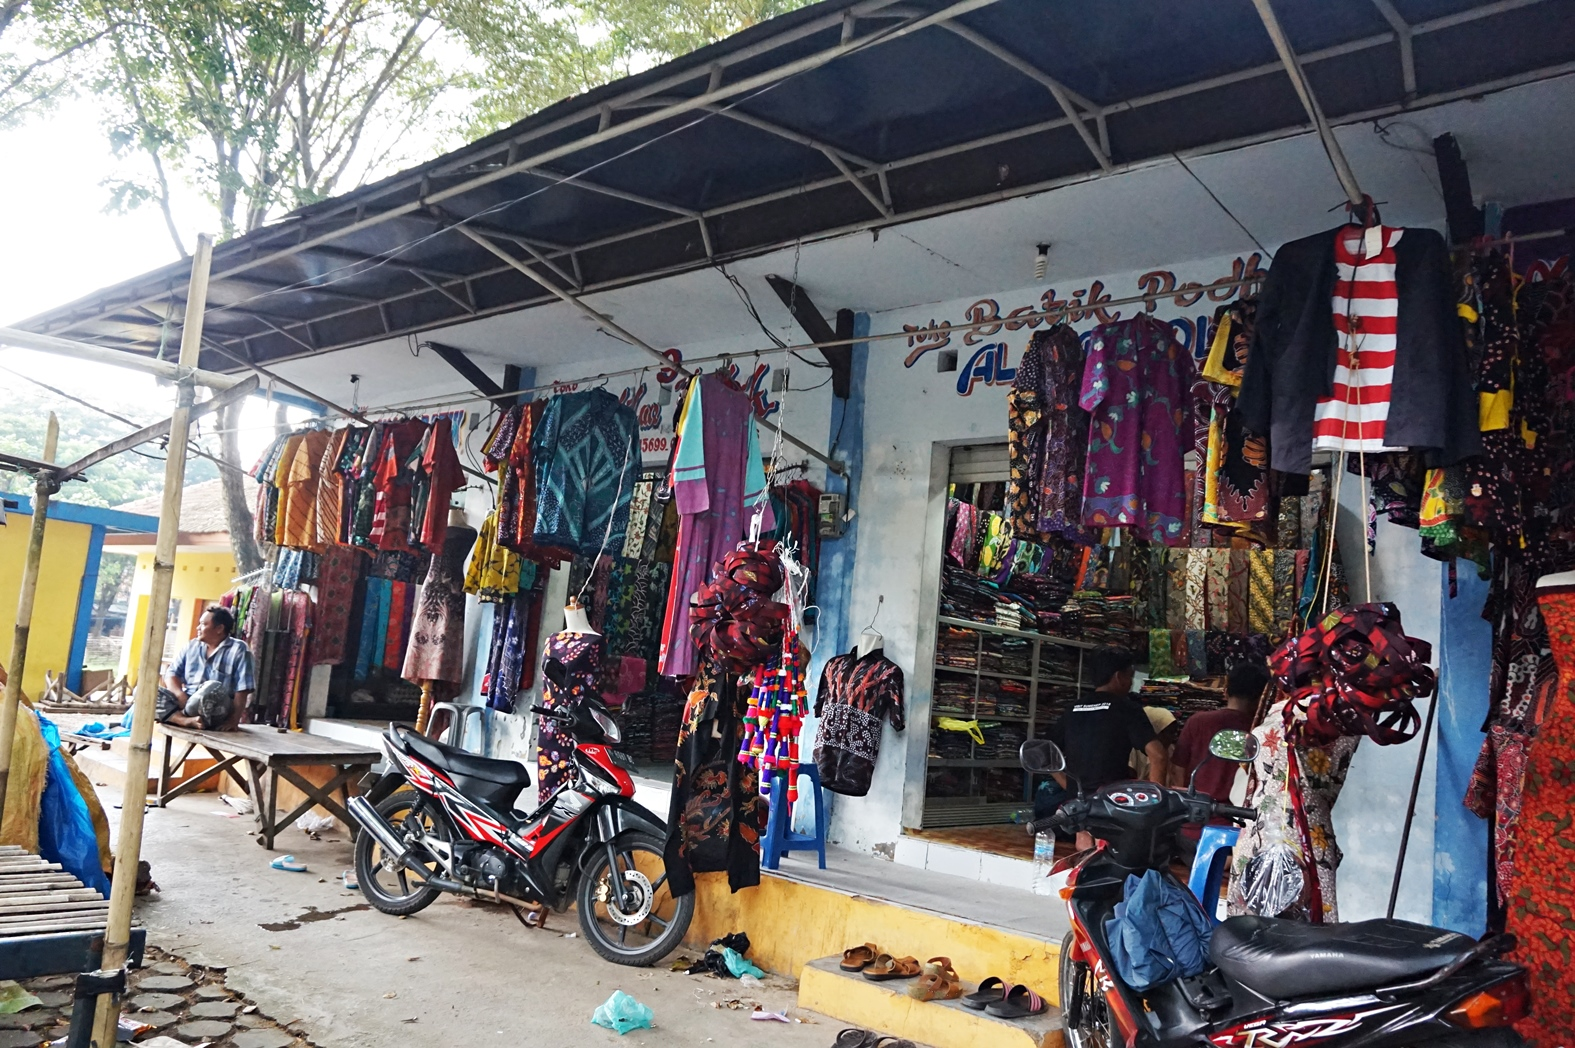 Berburu Batik Pamekasan Di Kios Batik Pasar 17 Agustus Pamekasan